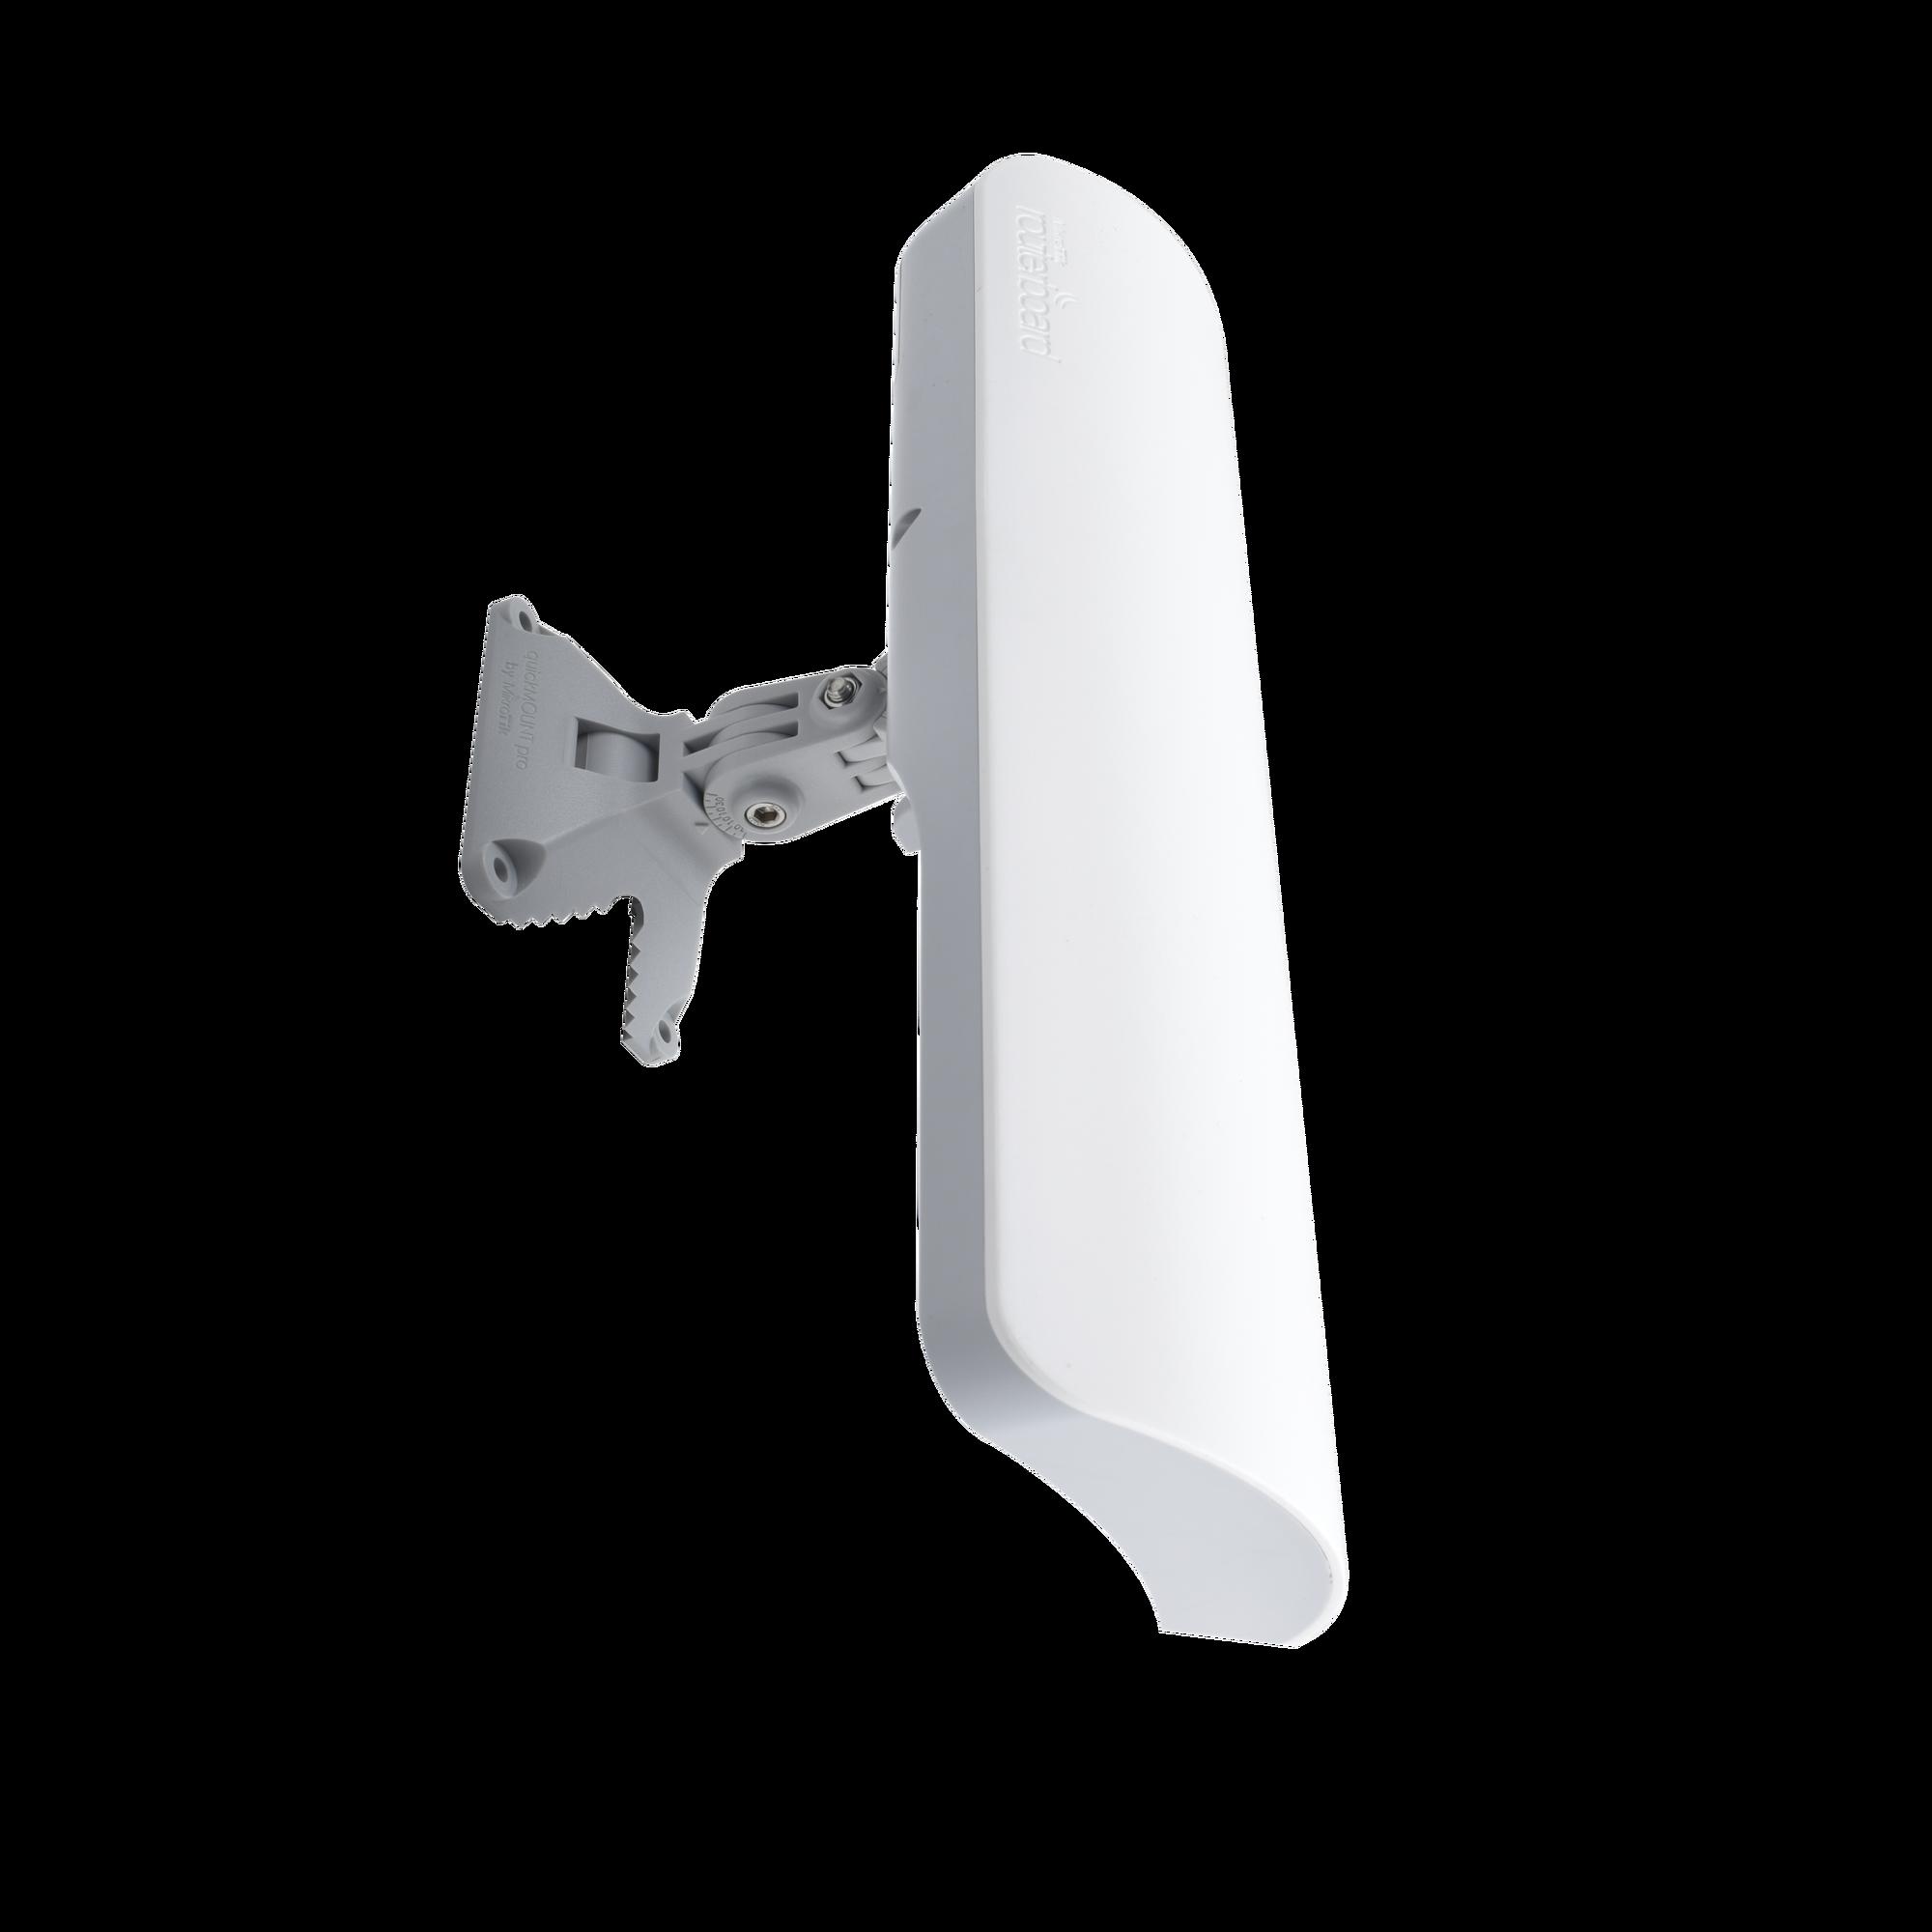 (mANT 15s) Antena Sectorial de 15dBi con Angulo de Apertura de 120? con un rango de 5.17 - 5.825GHz